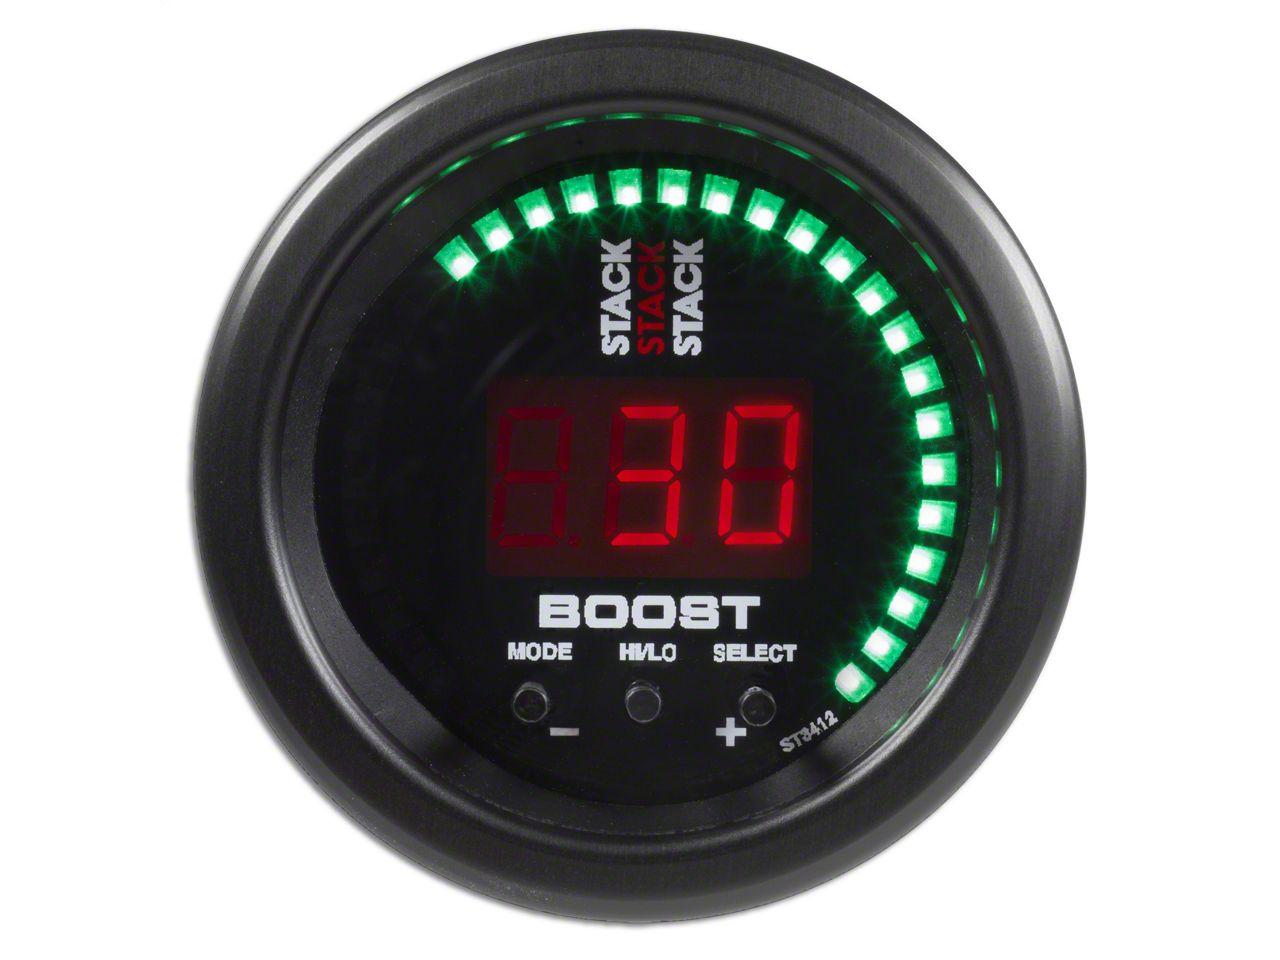 Auto Meter Stack Boost Controller Gauge - Black (07-18 Sierra 1500)